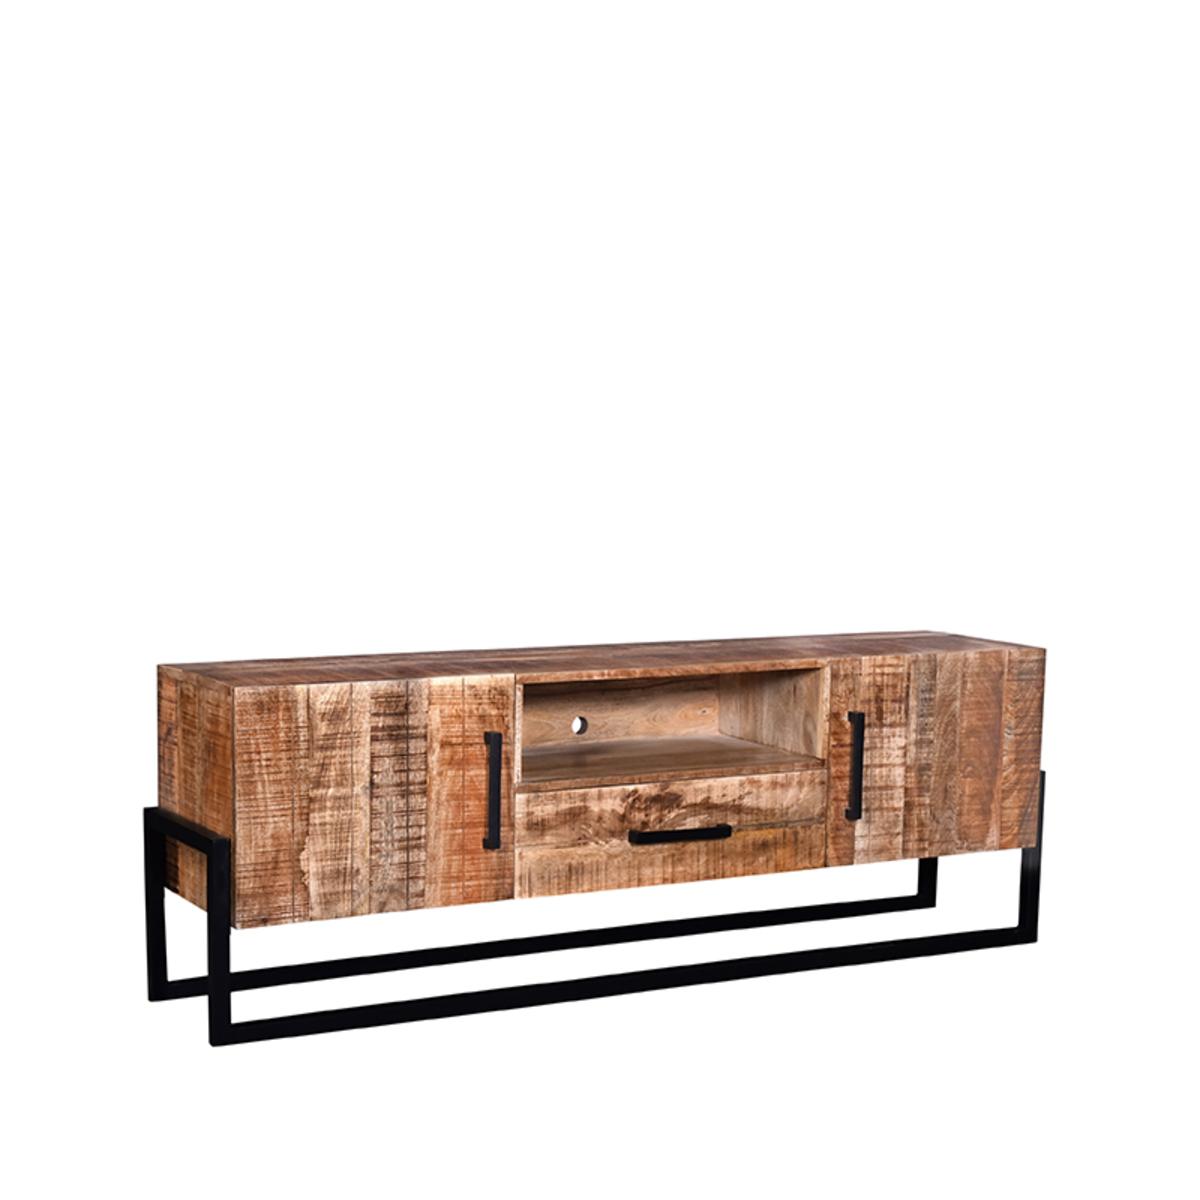 LABEL51 Tv-meubel Bolivia - Rough - Mangohout